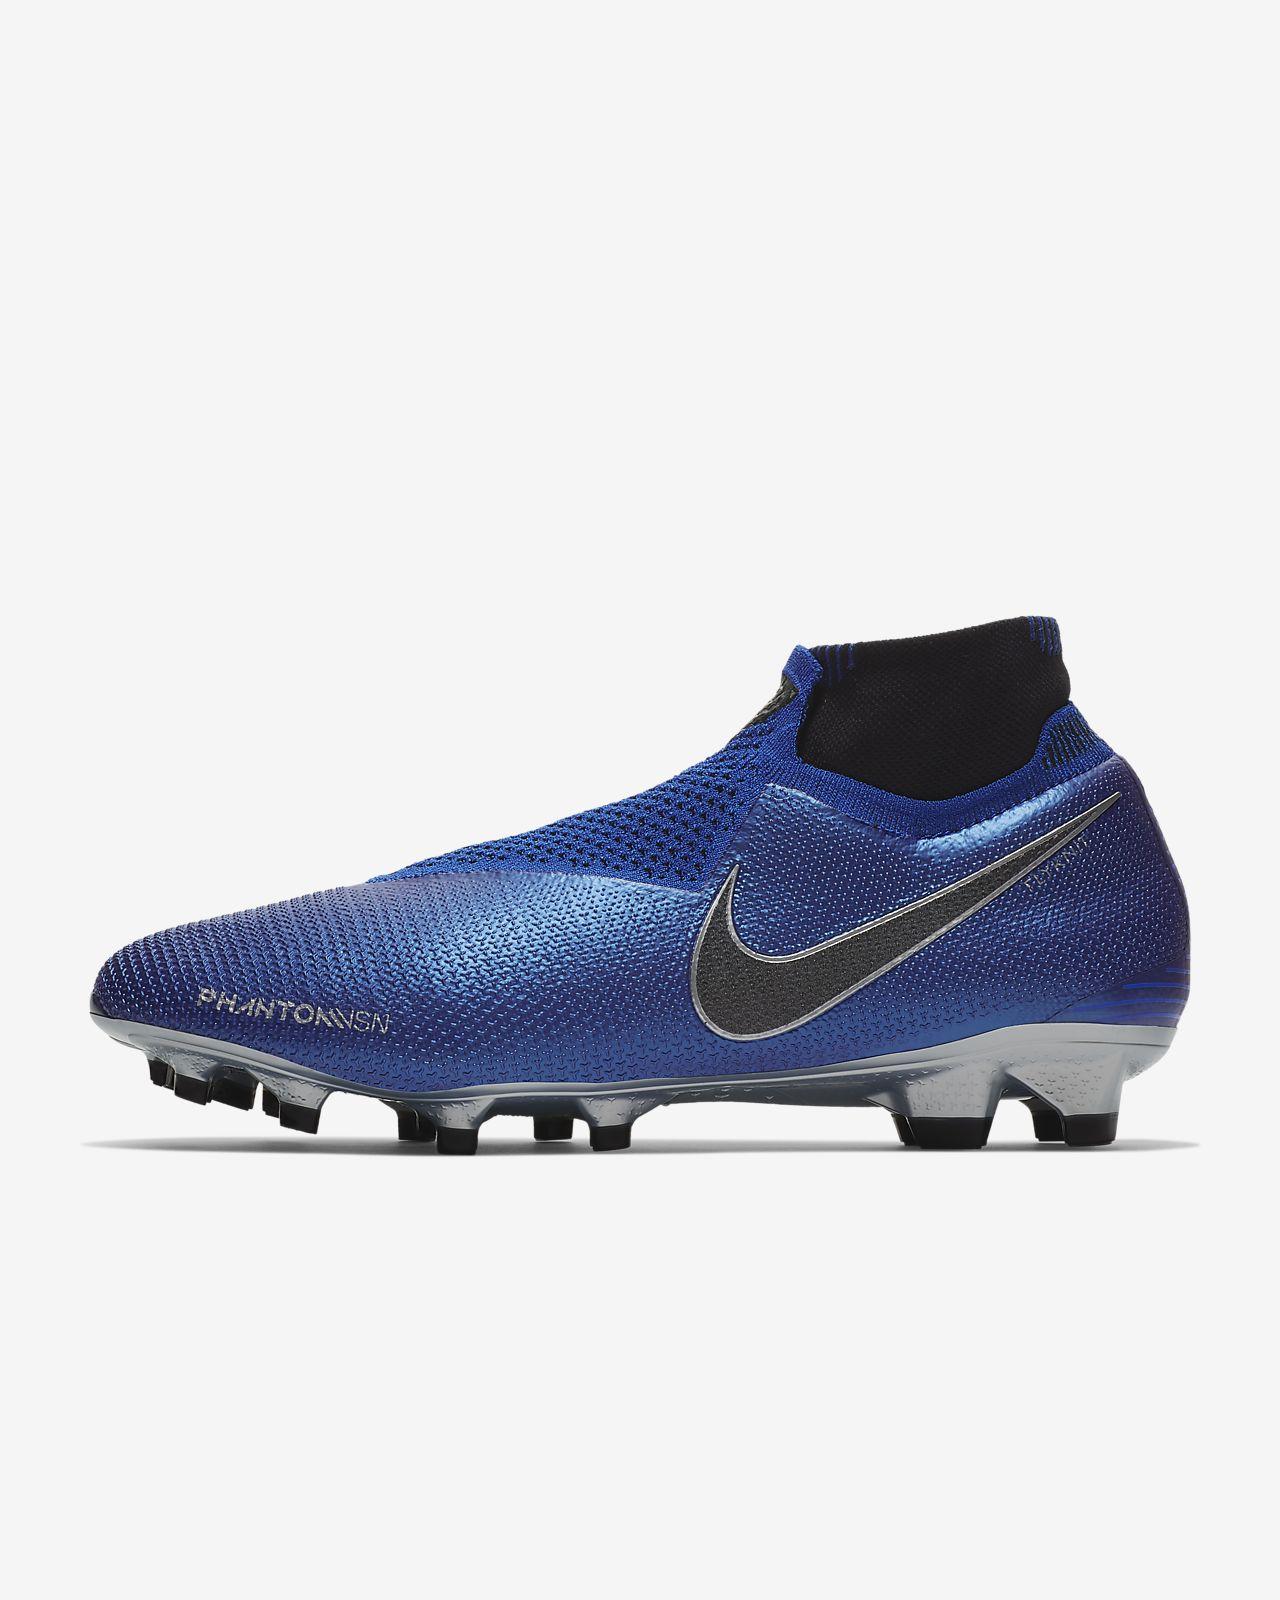 Calzado de fútbol para terreno firme Nike Phantom Vision Elite Dynamic Fit FG